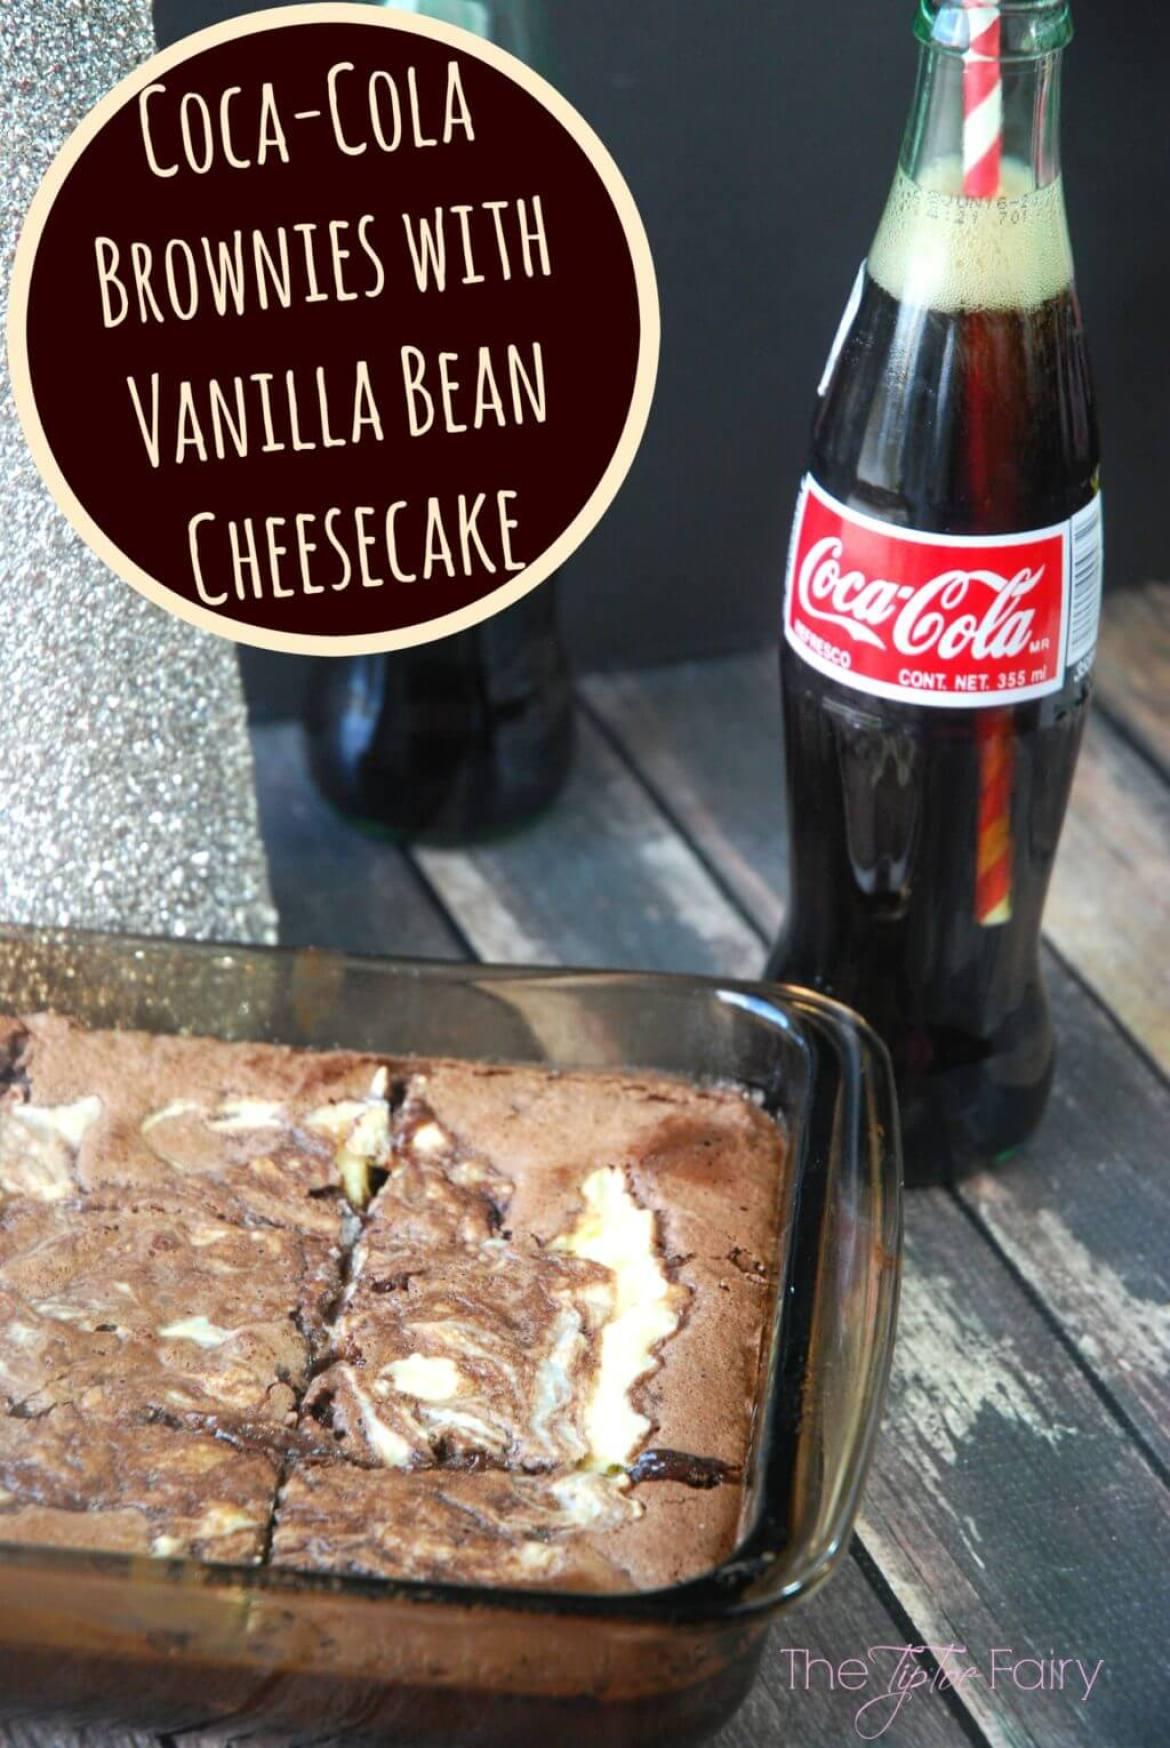 Coca-Cola Brownies with Vanilla Bean Cheesecake #ad #ShareHolidayJoy | The TipToe Fairy